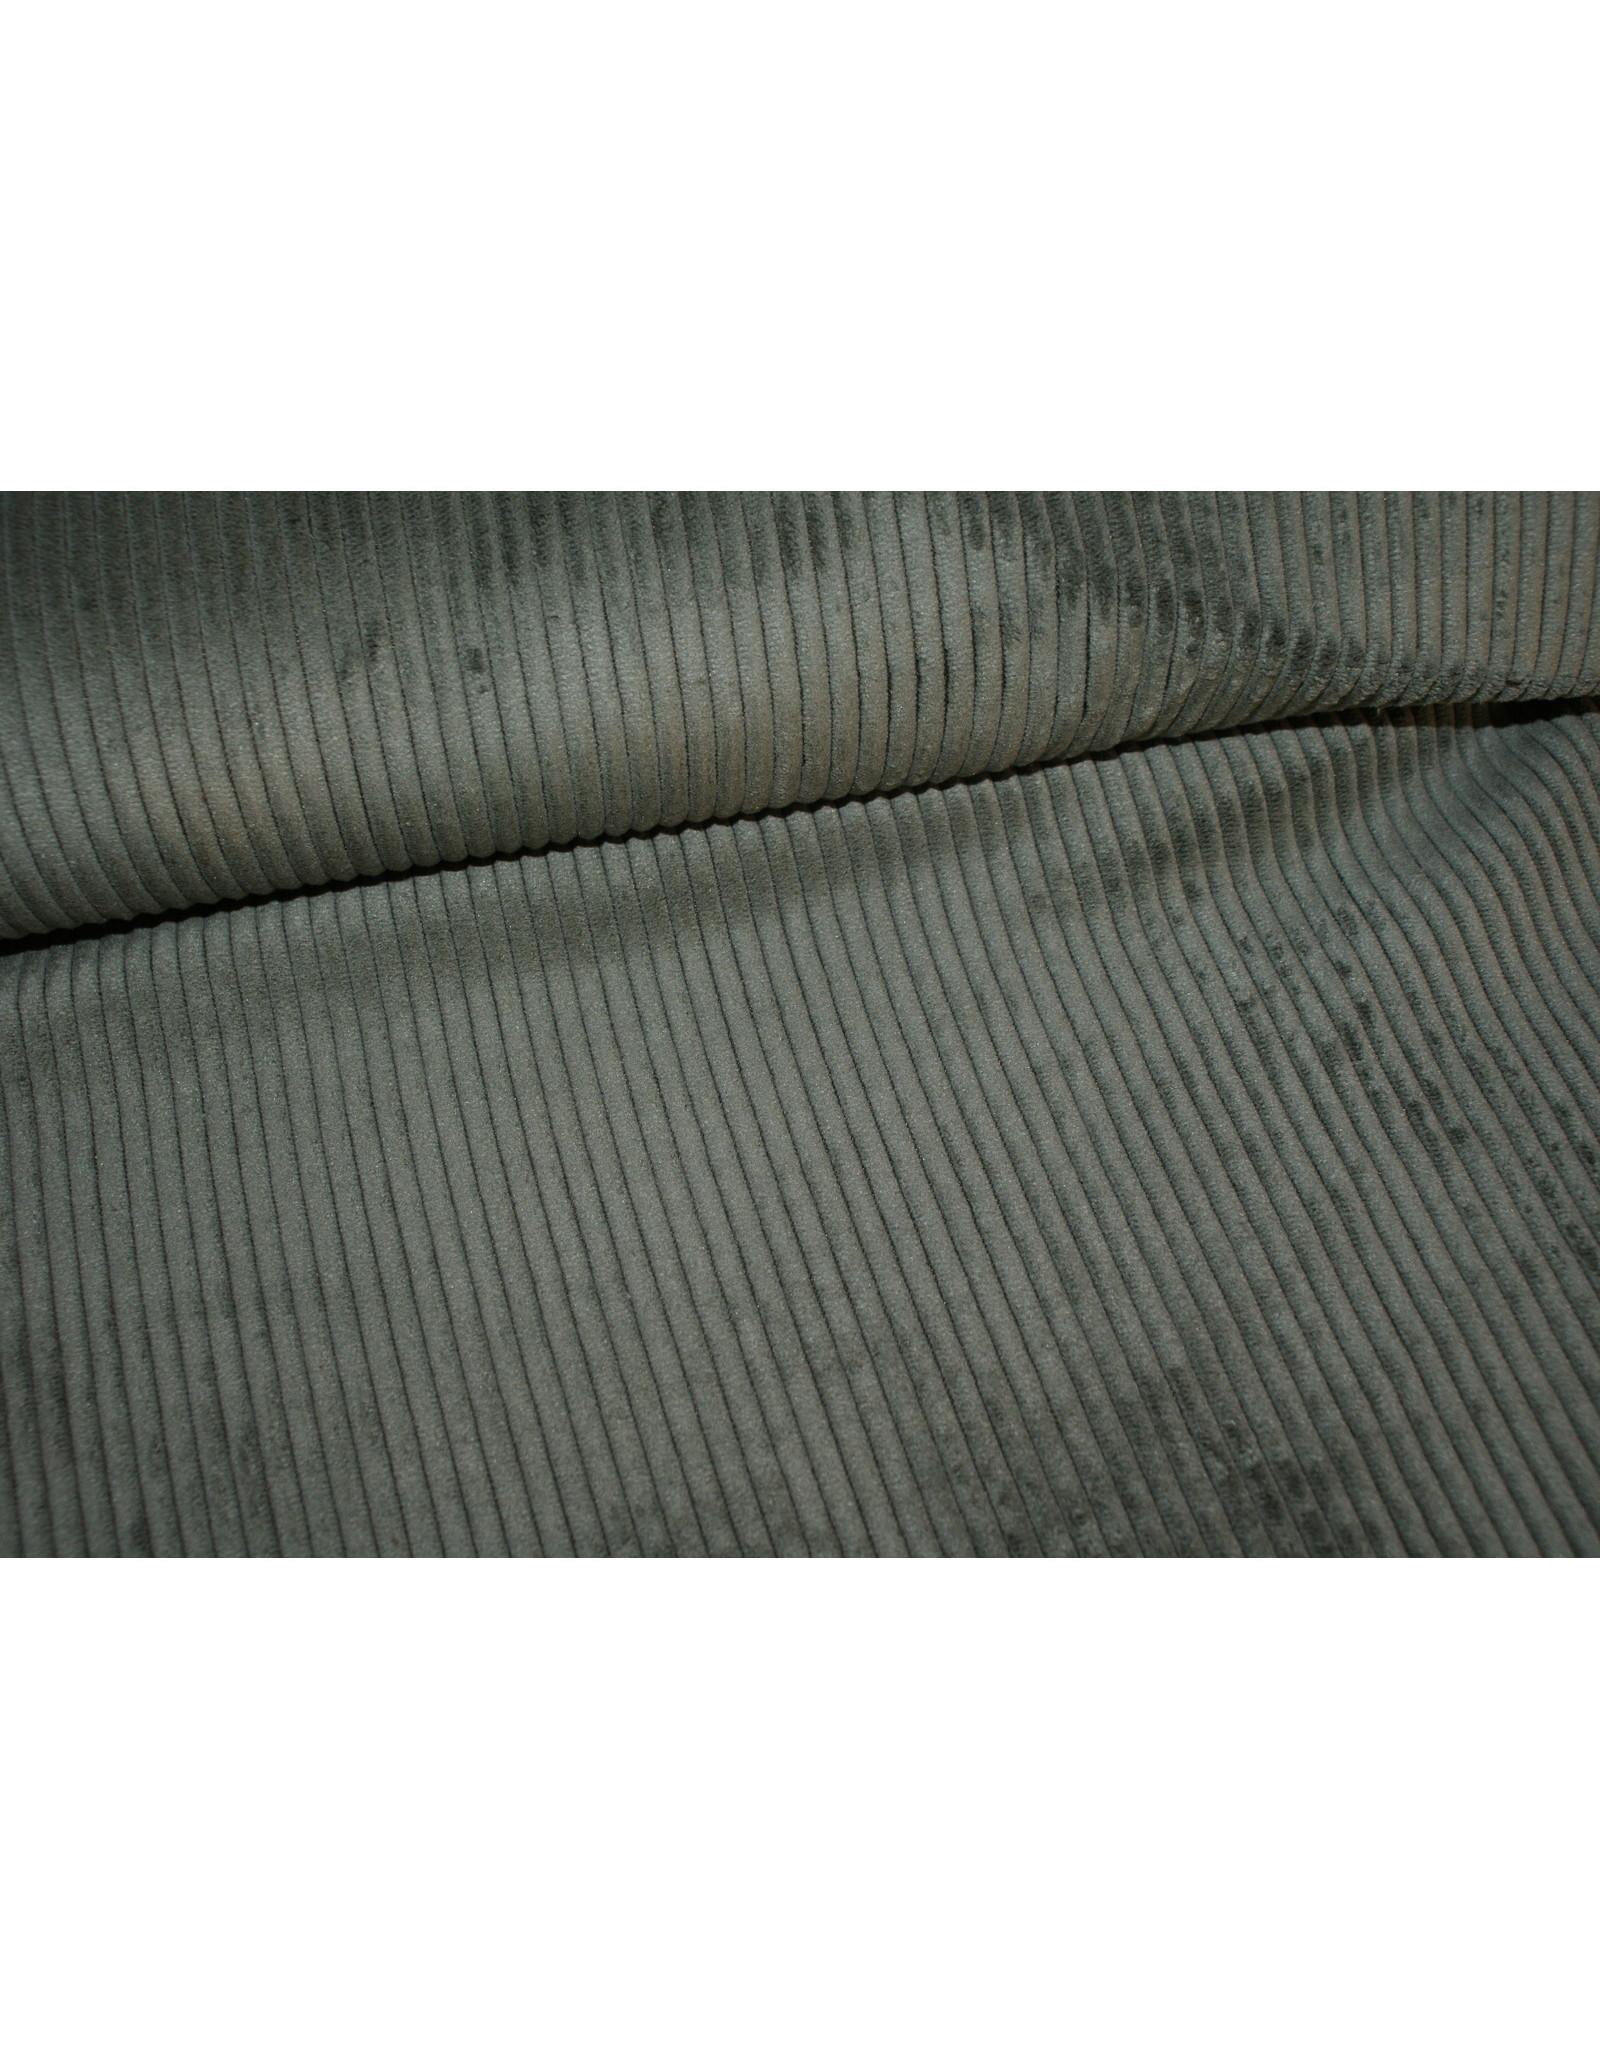 Editex Ribfluweel kaki groen COUPON 95 cm